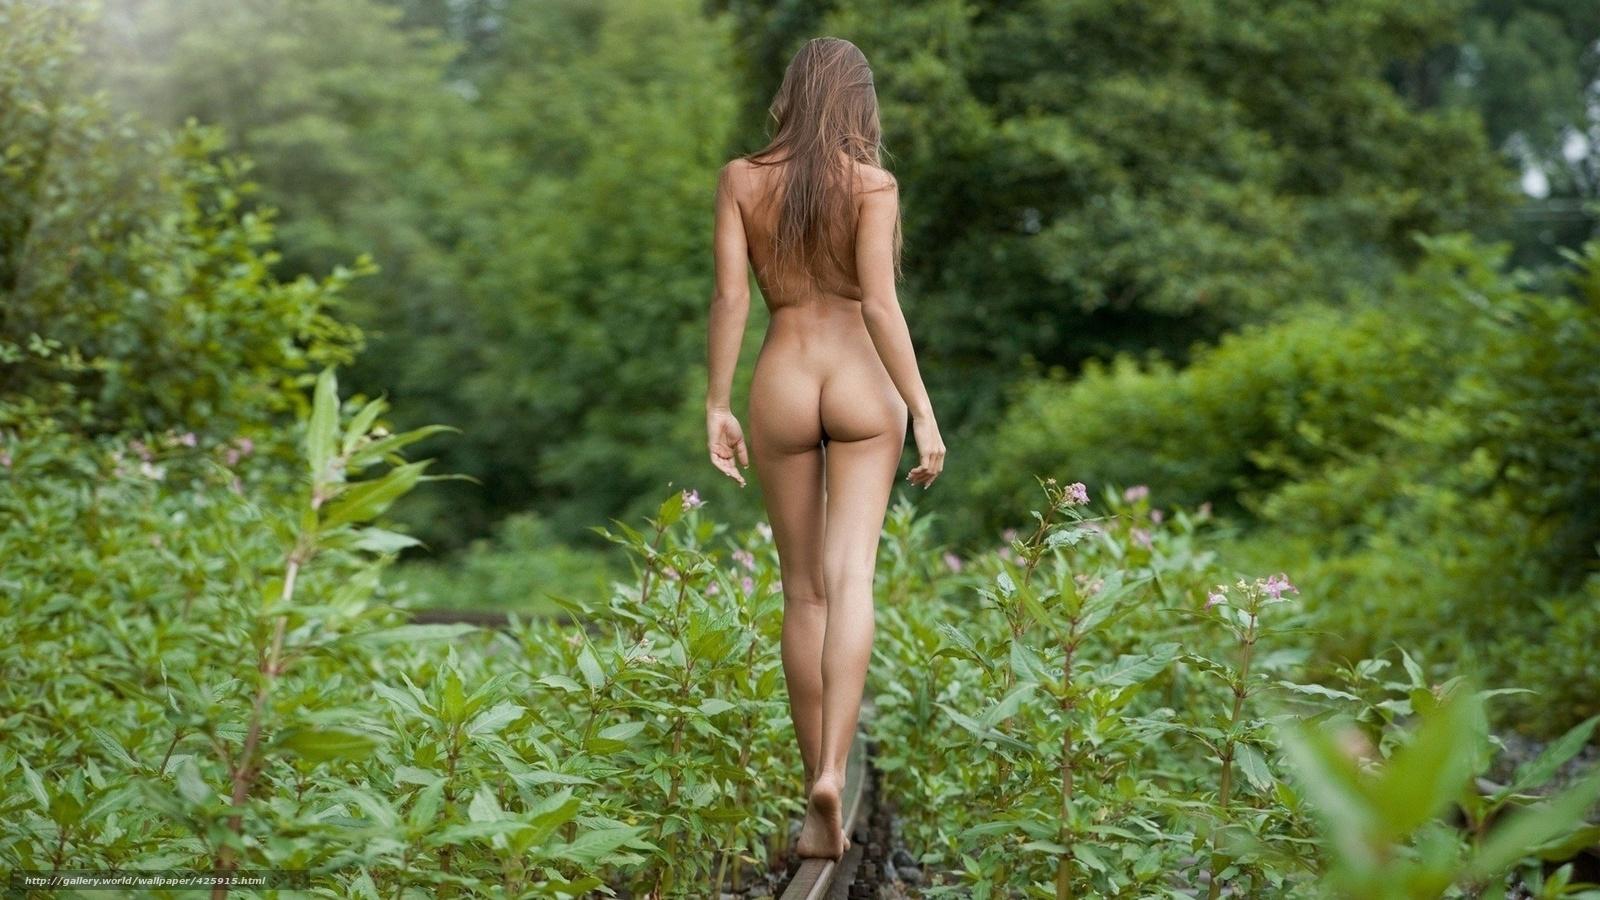 krasivie-eroticheskie-foto-na-prirode